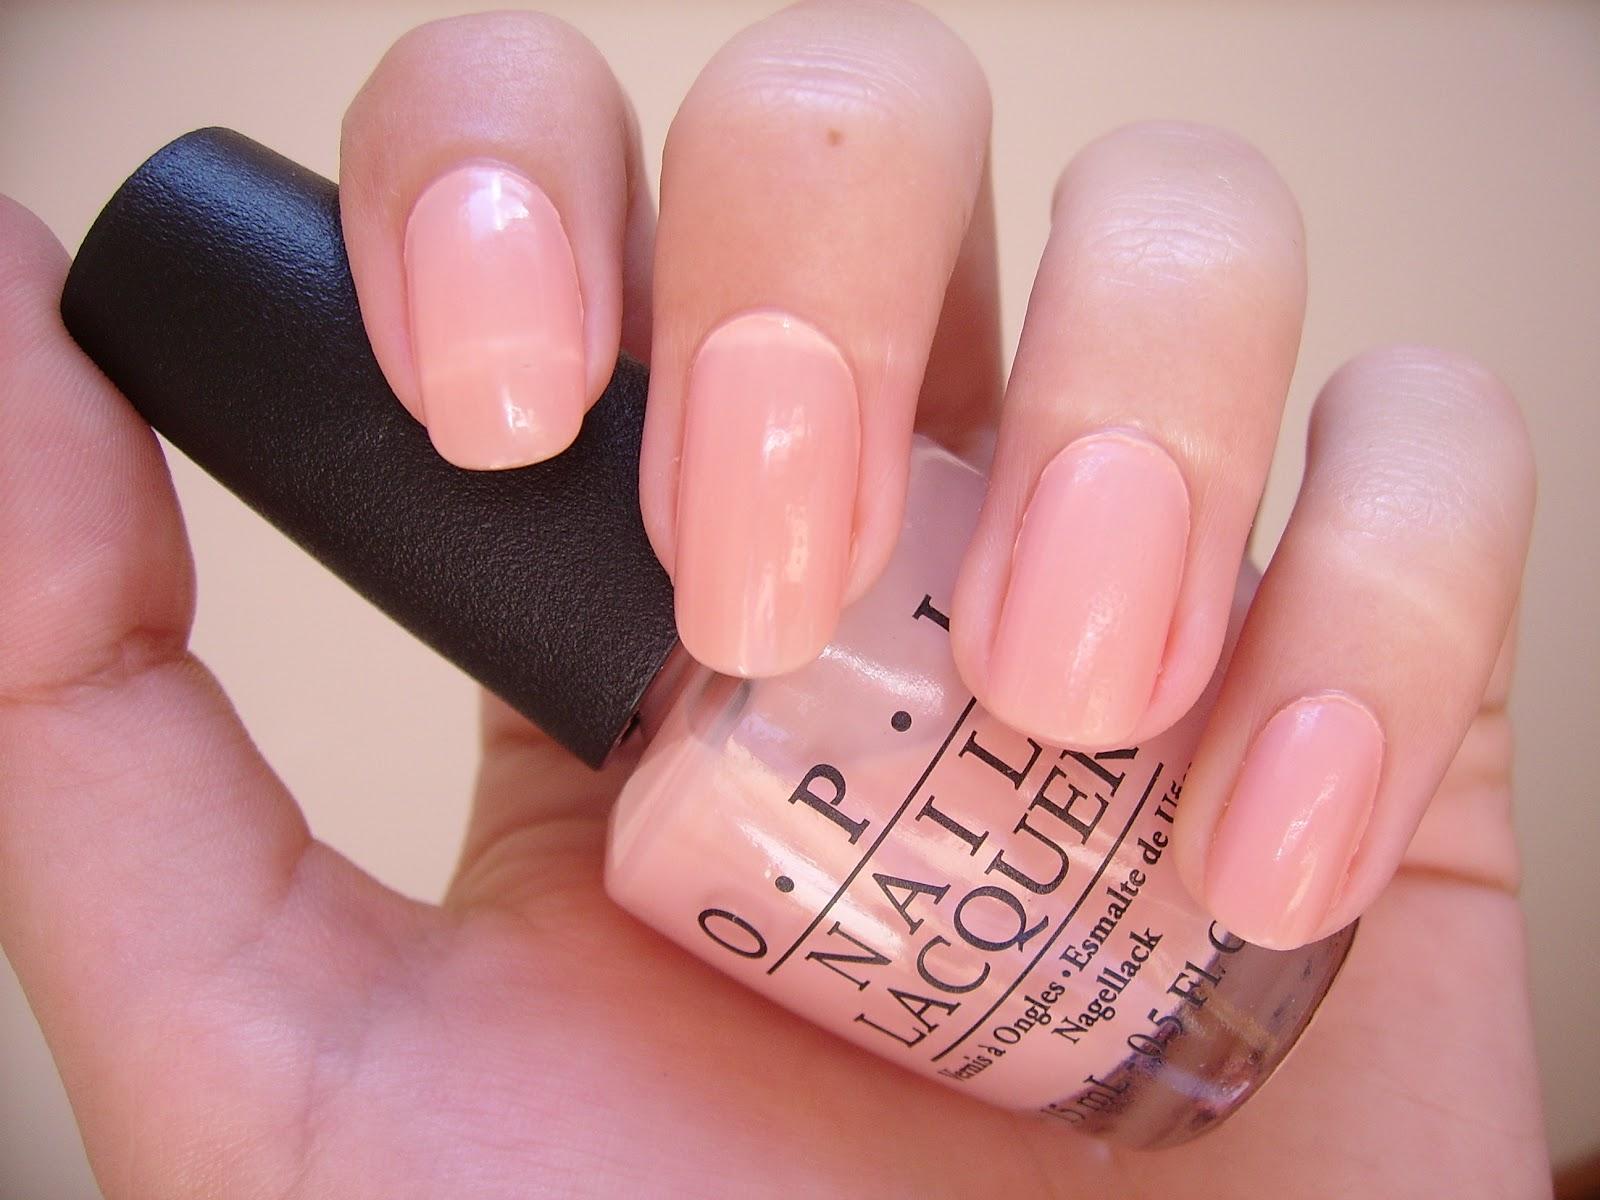 SSA59907 - Beautifull nail colours :)